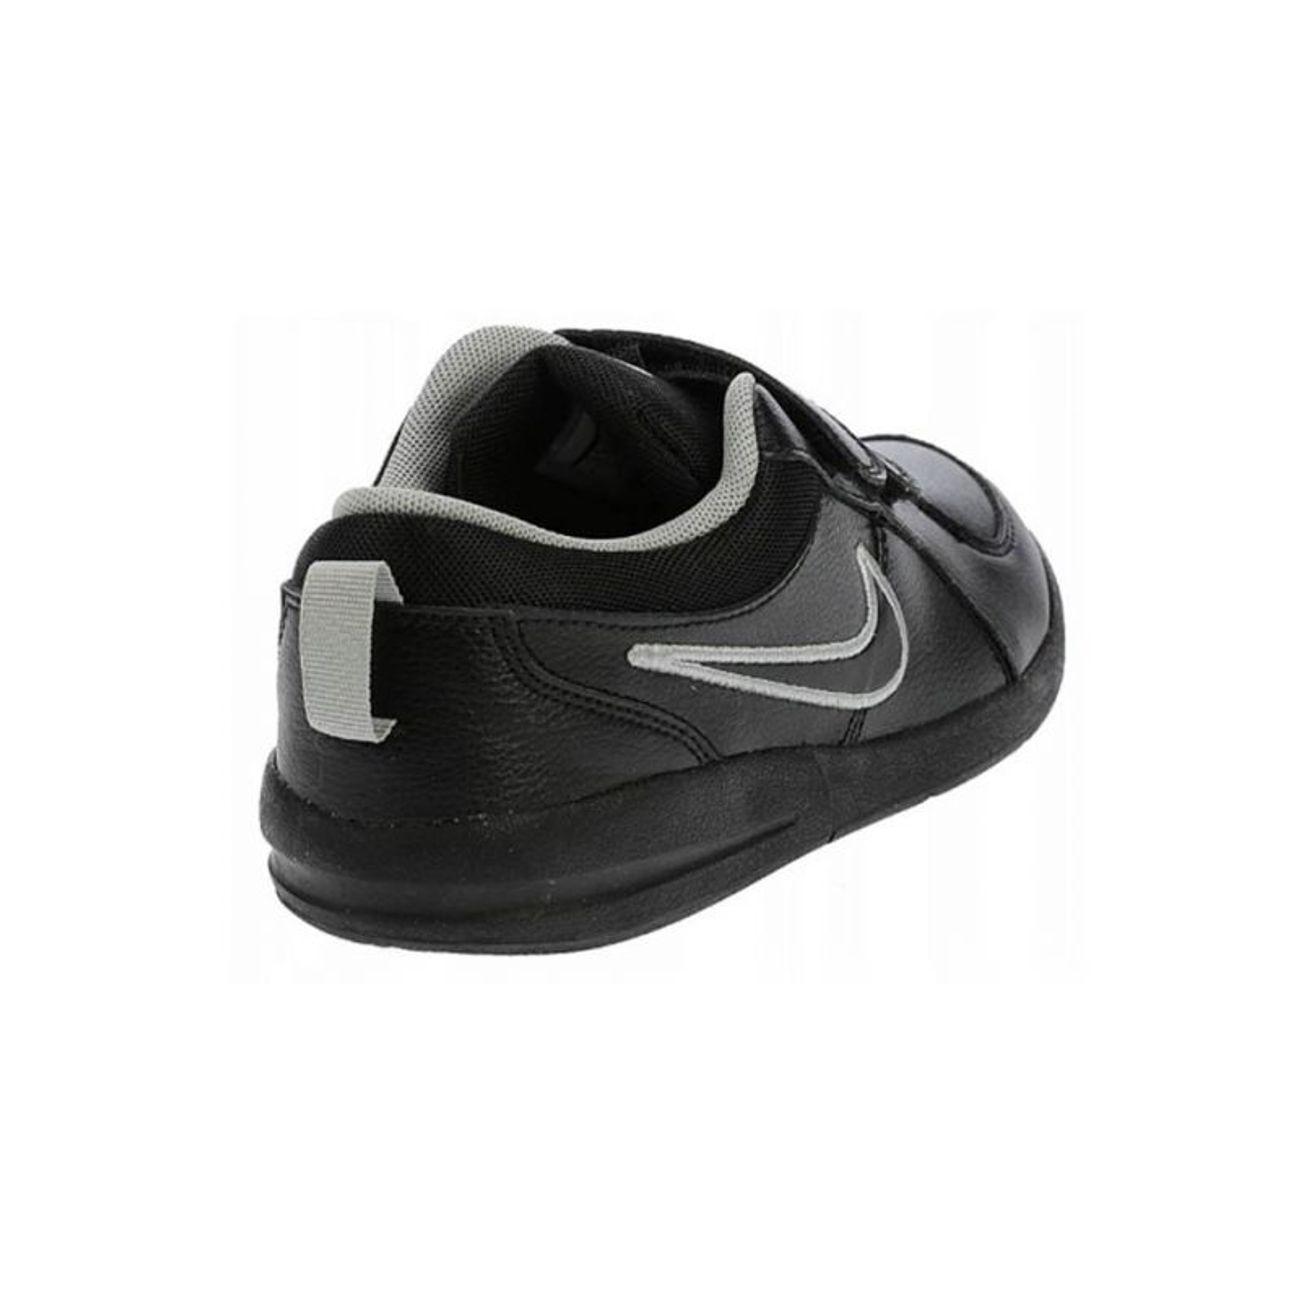 Junior 4 Psv Pico Padel Nike Noir 001 Adulte Ni454500 rdxBeCo